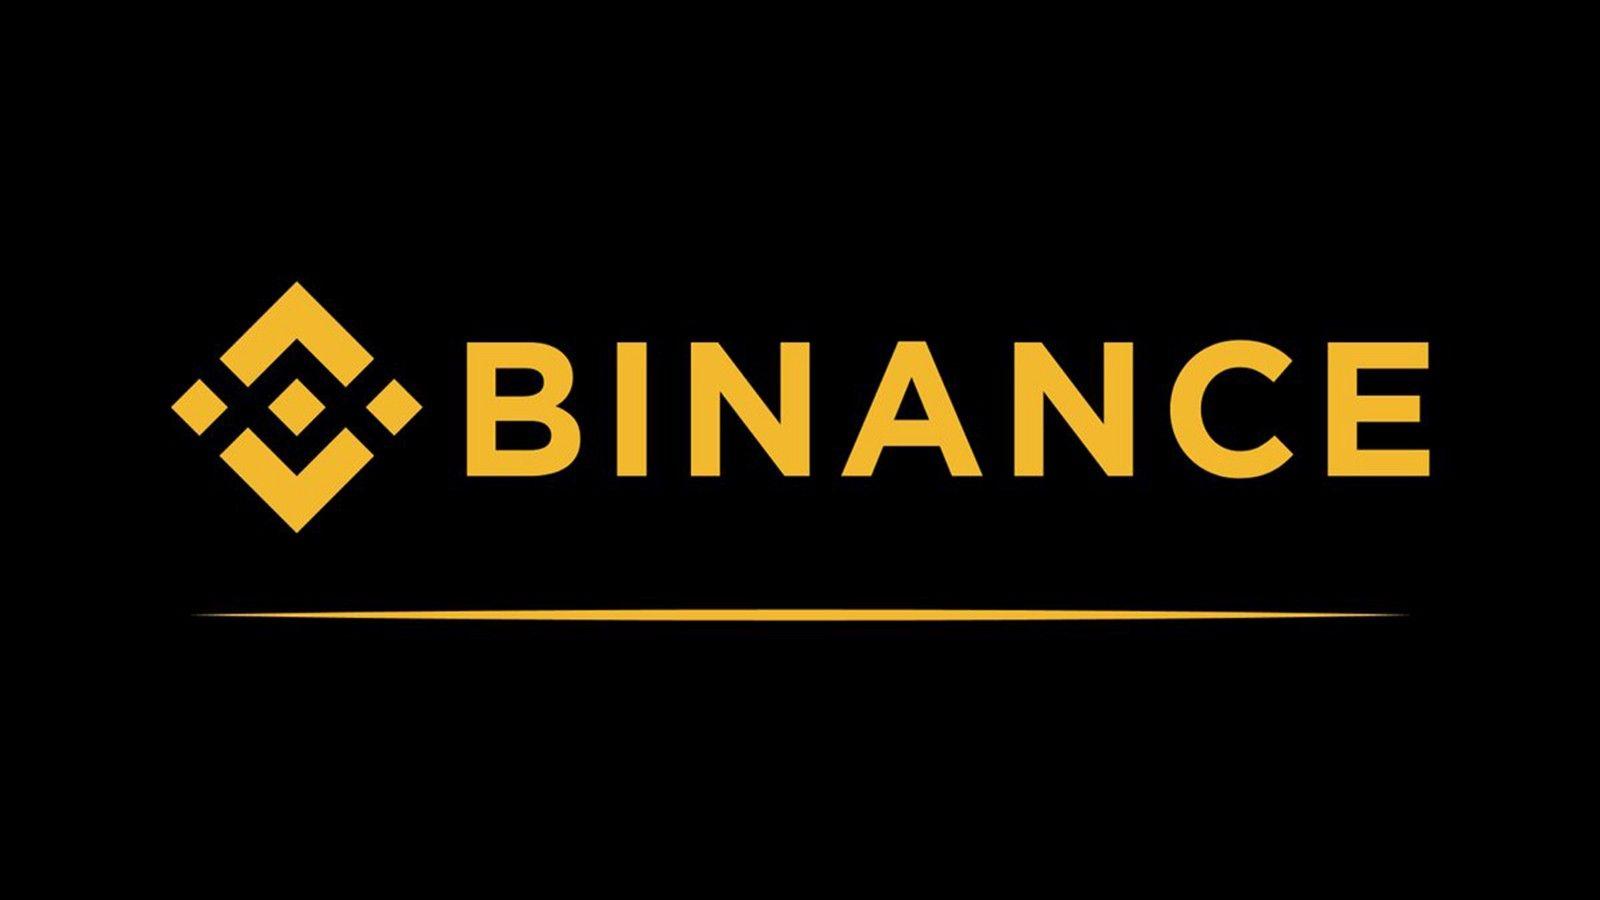 Binance Trading Fees Discount & How to Reduce Fees on Binance (Tricks)